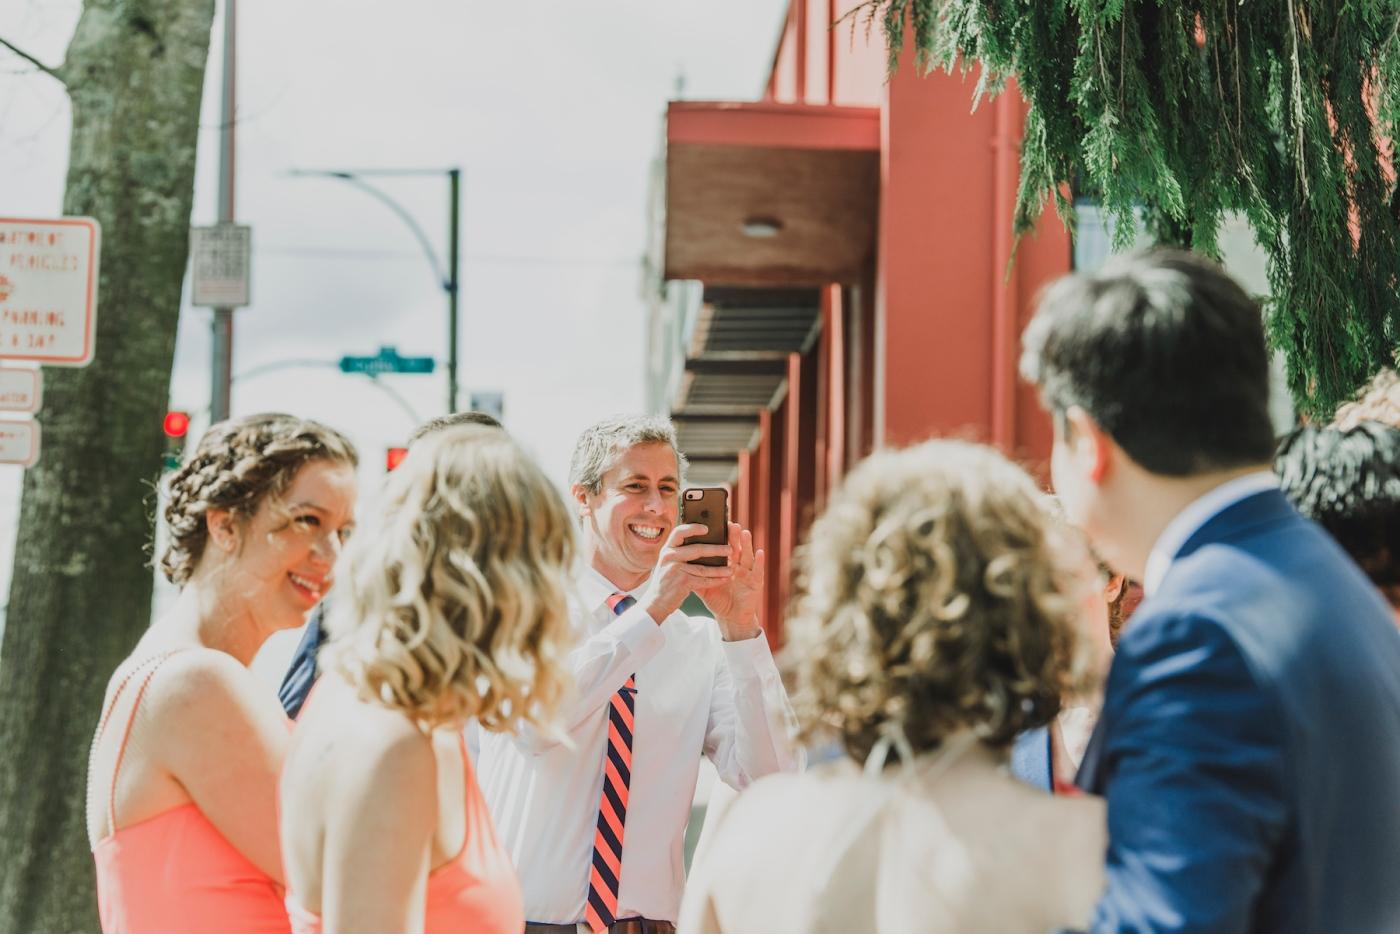 DSC_2171Everett_Wedding_Ballroom_Jane_Speleers_photography_Rachel_and_Edmund_Bridesmaids_peach_dresses_groomsmen_2017